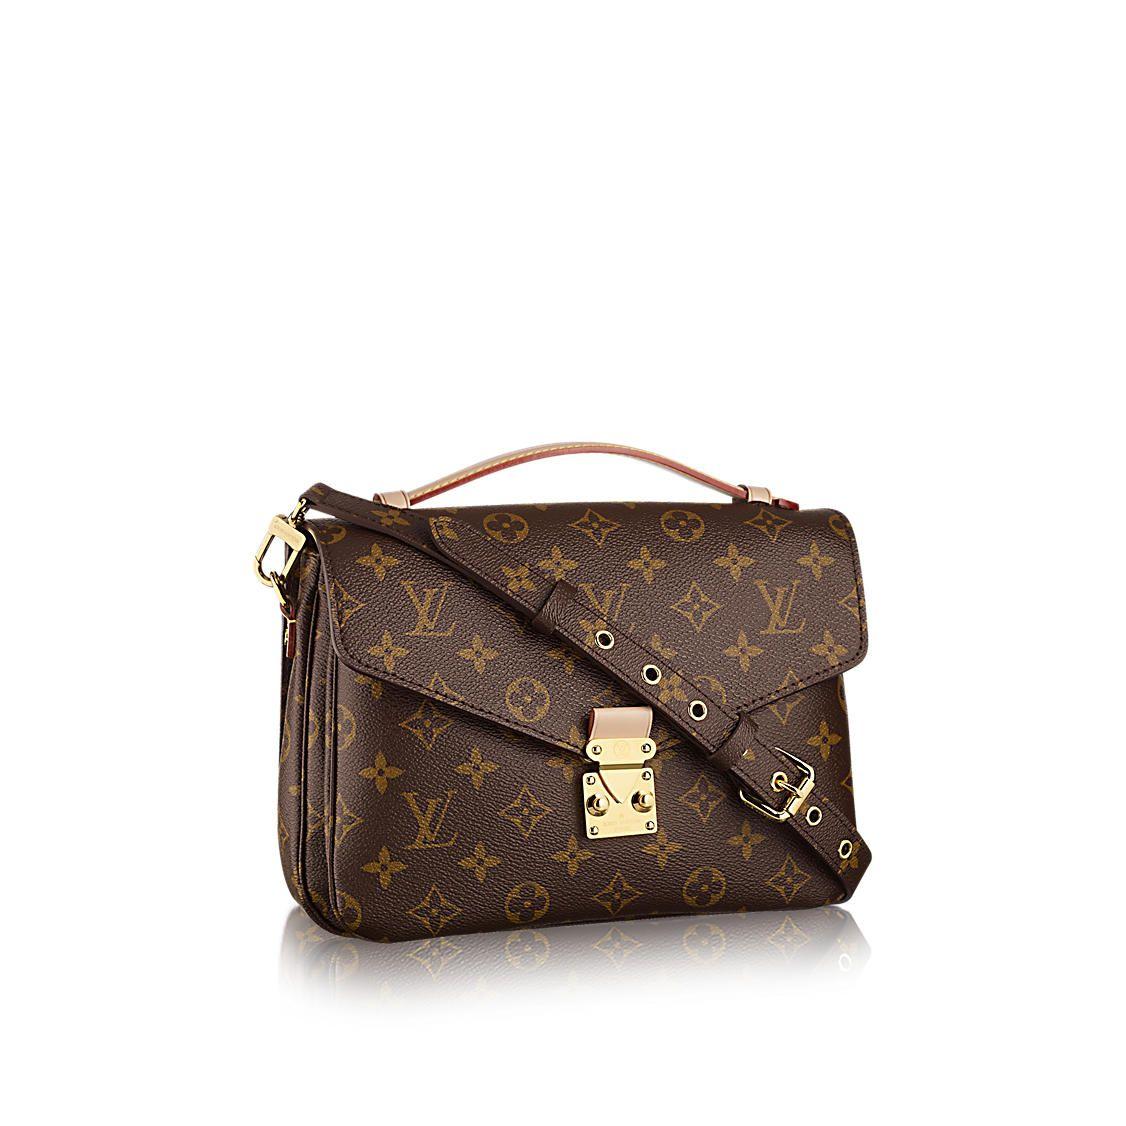 LOUIS VUITTON Official Website United Kingdom - Discover Louis Vuitton s  Pochette Metis collection for women in Monogram canvas. fef969bd17f78